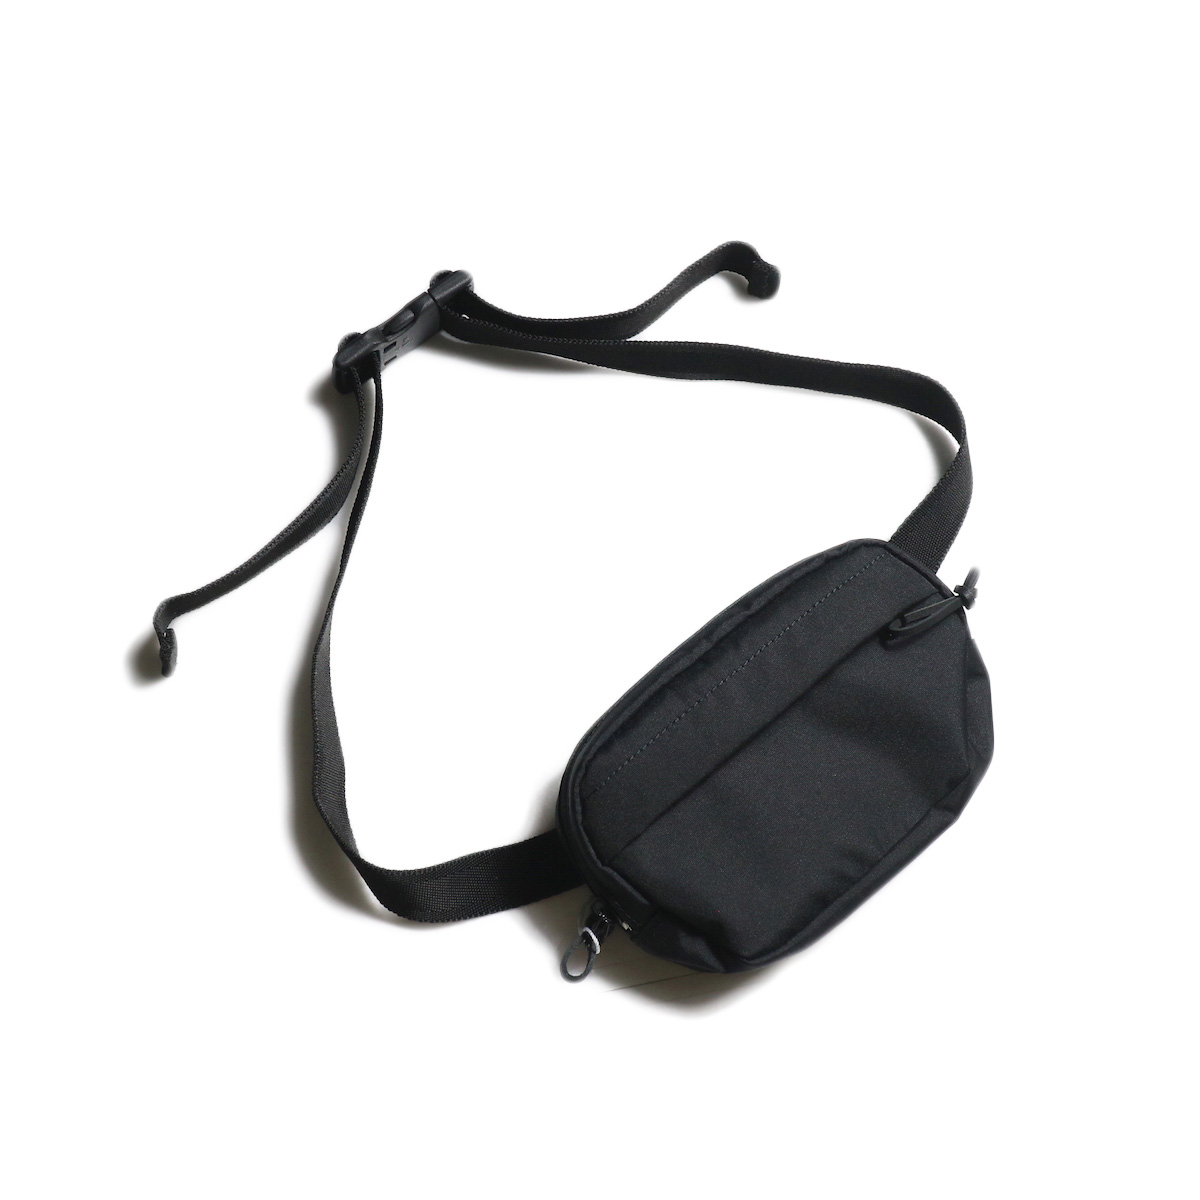 UNIVERSAL PRODUCTS / CORDURA SMALL WAIST BAG (Black)